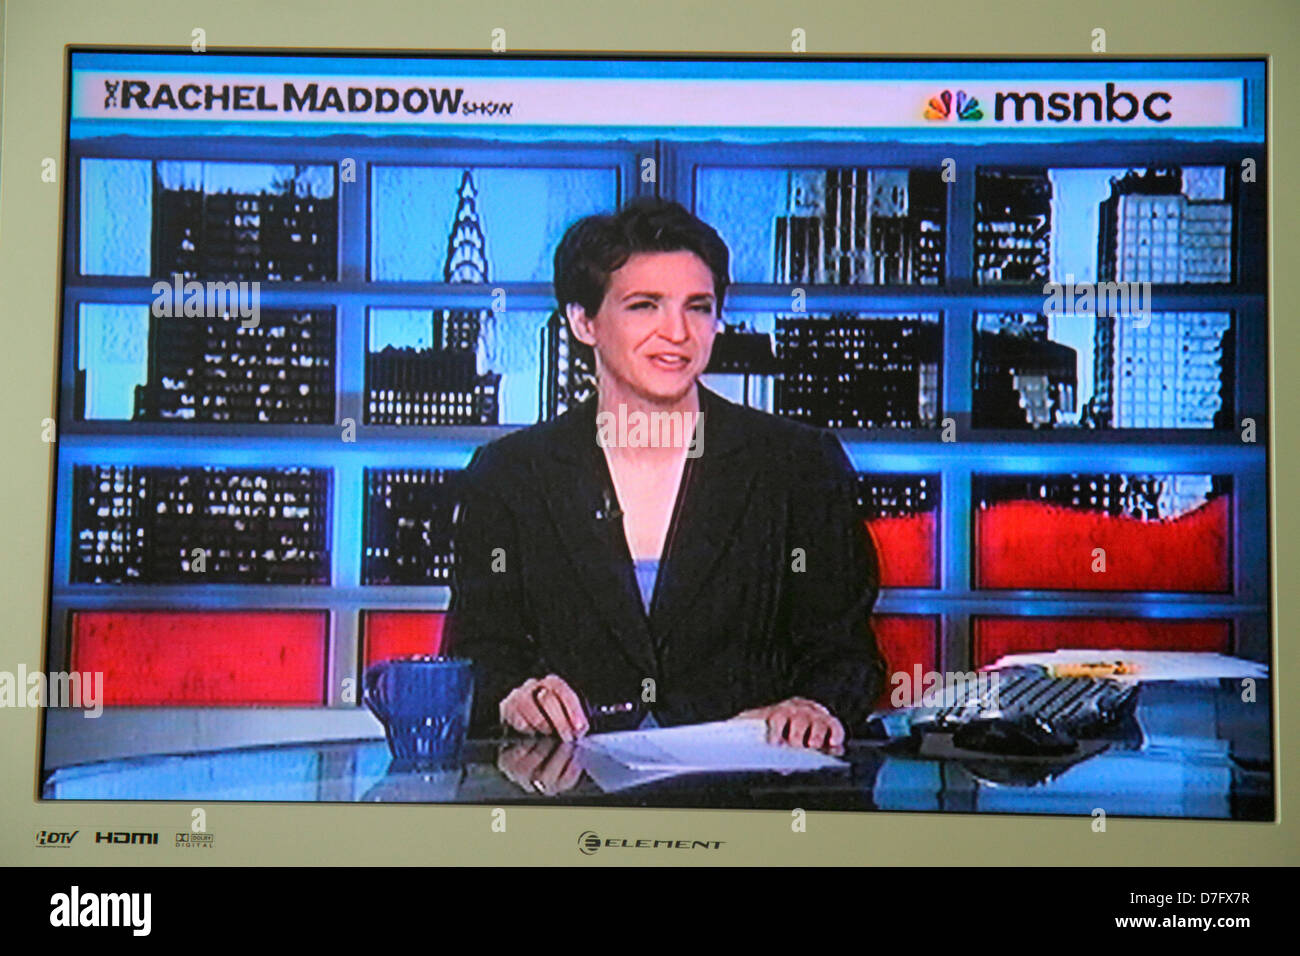 Miami Beach Florida TV television screen flat panel HDTV monitor MSNBC Rachel Maddow Show political analyst commentator - Stock Image